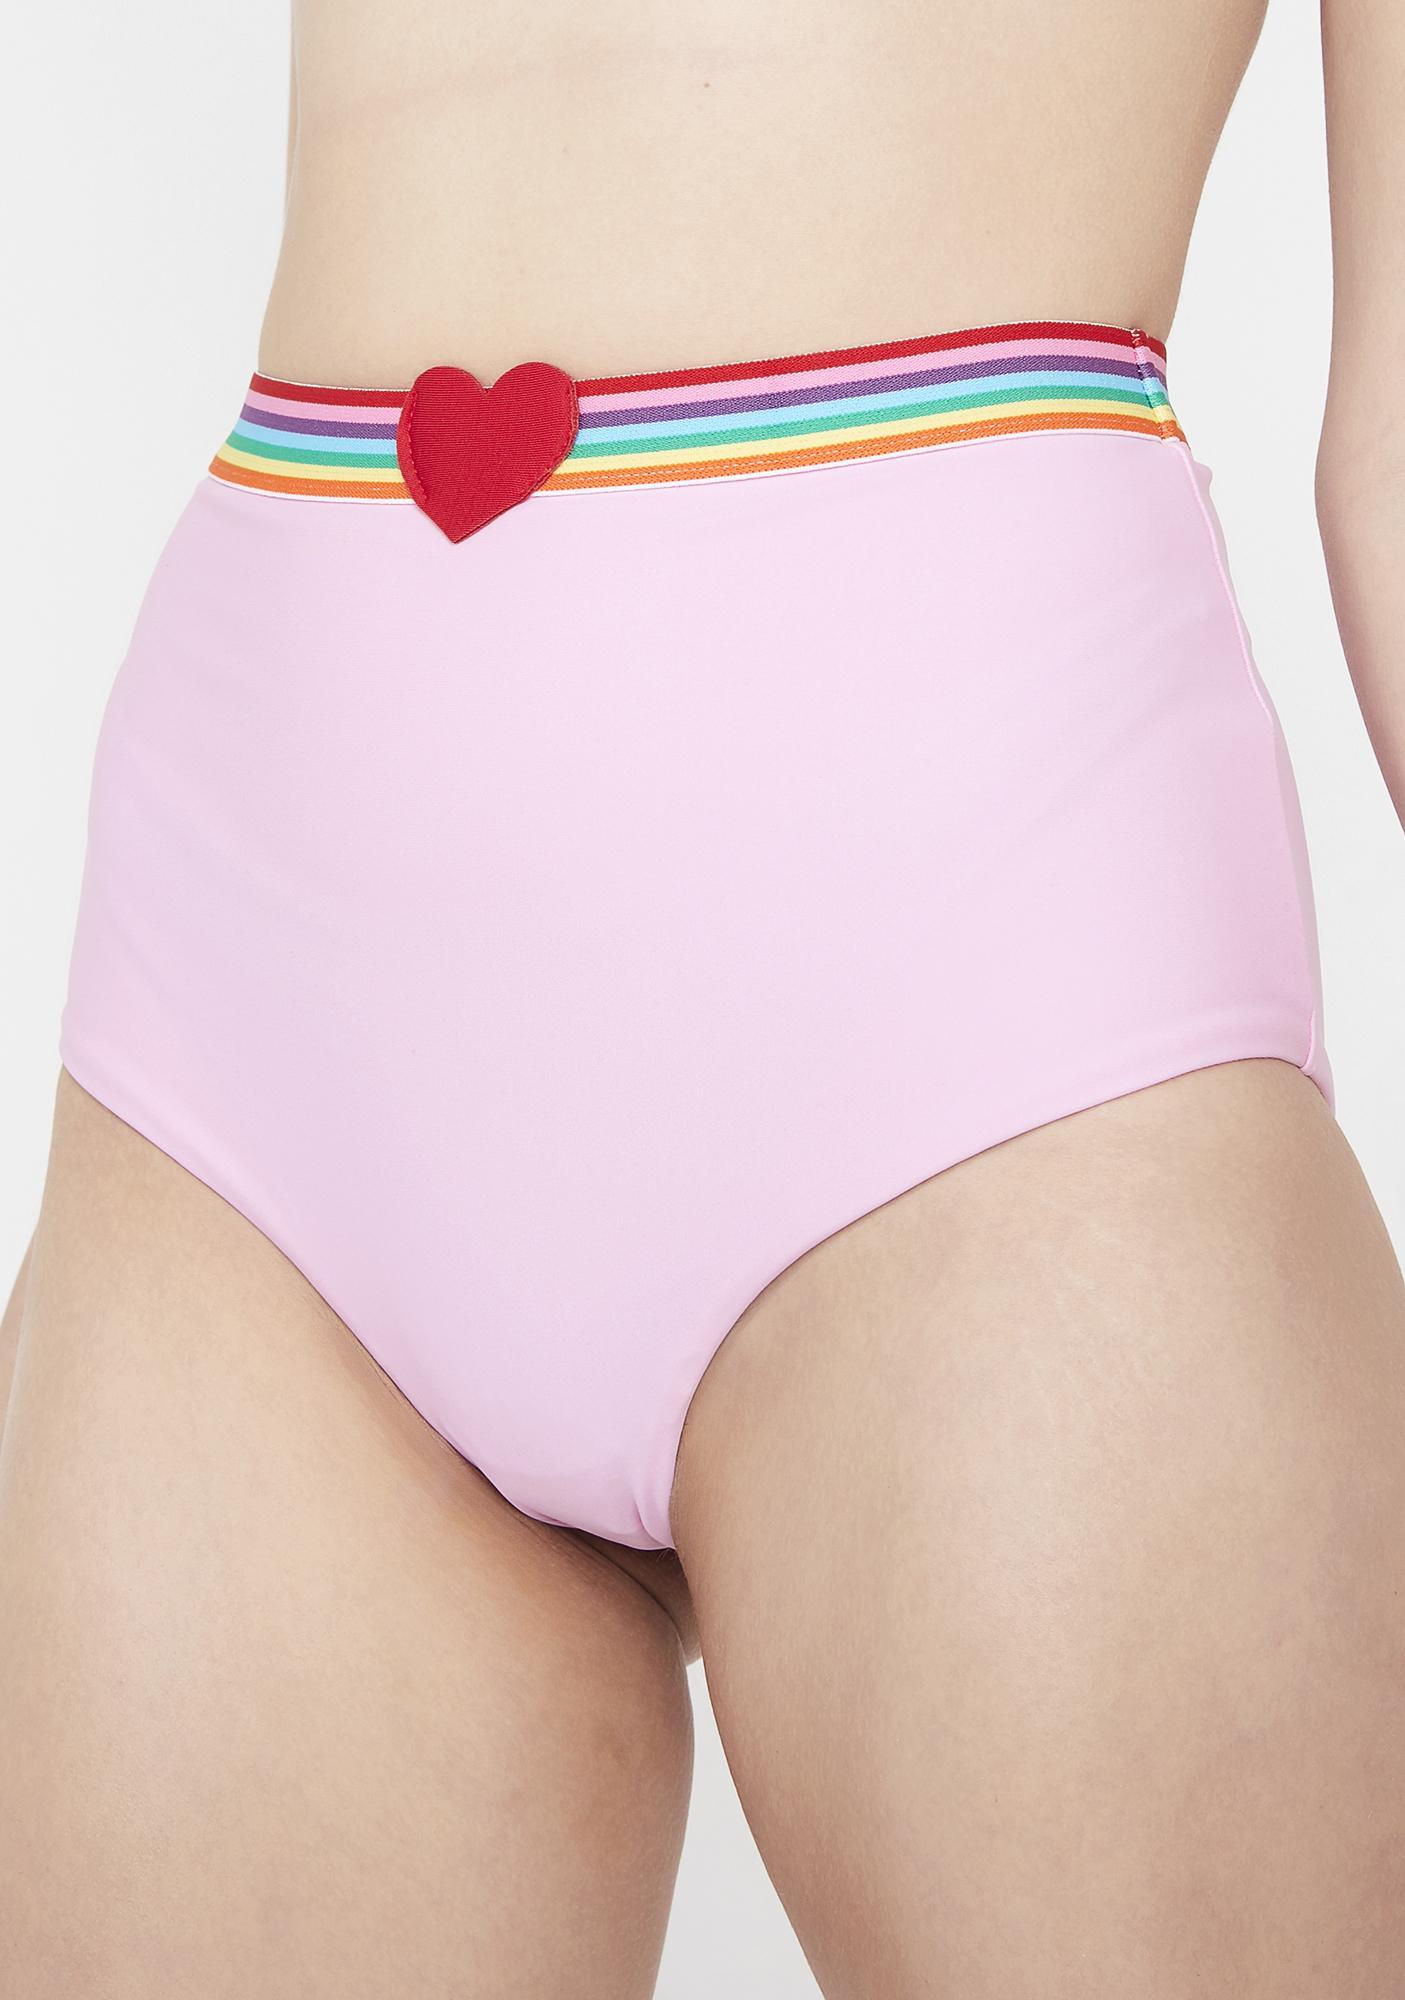 Lazy Oaf Rainbow Love Bikini Bottoms